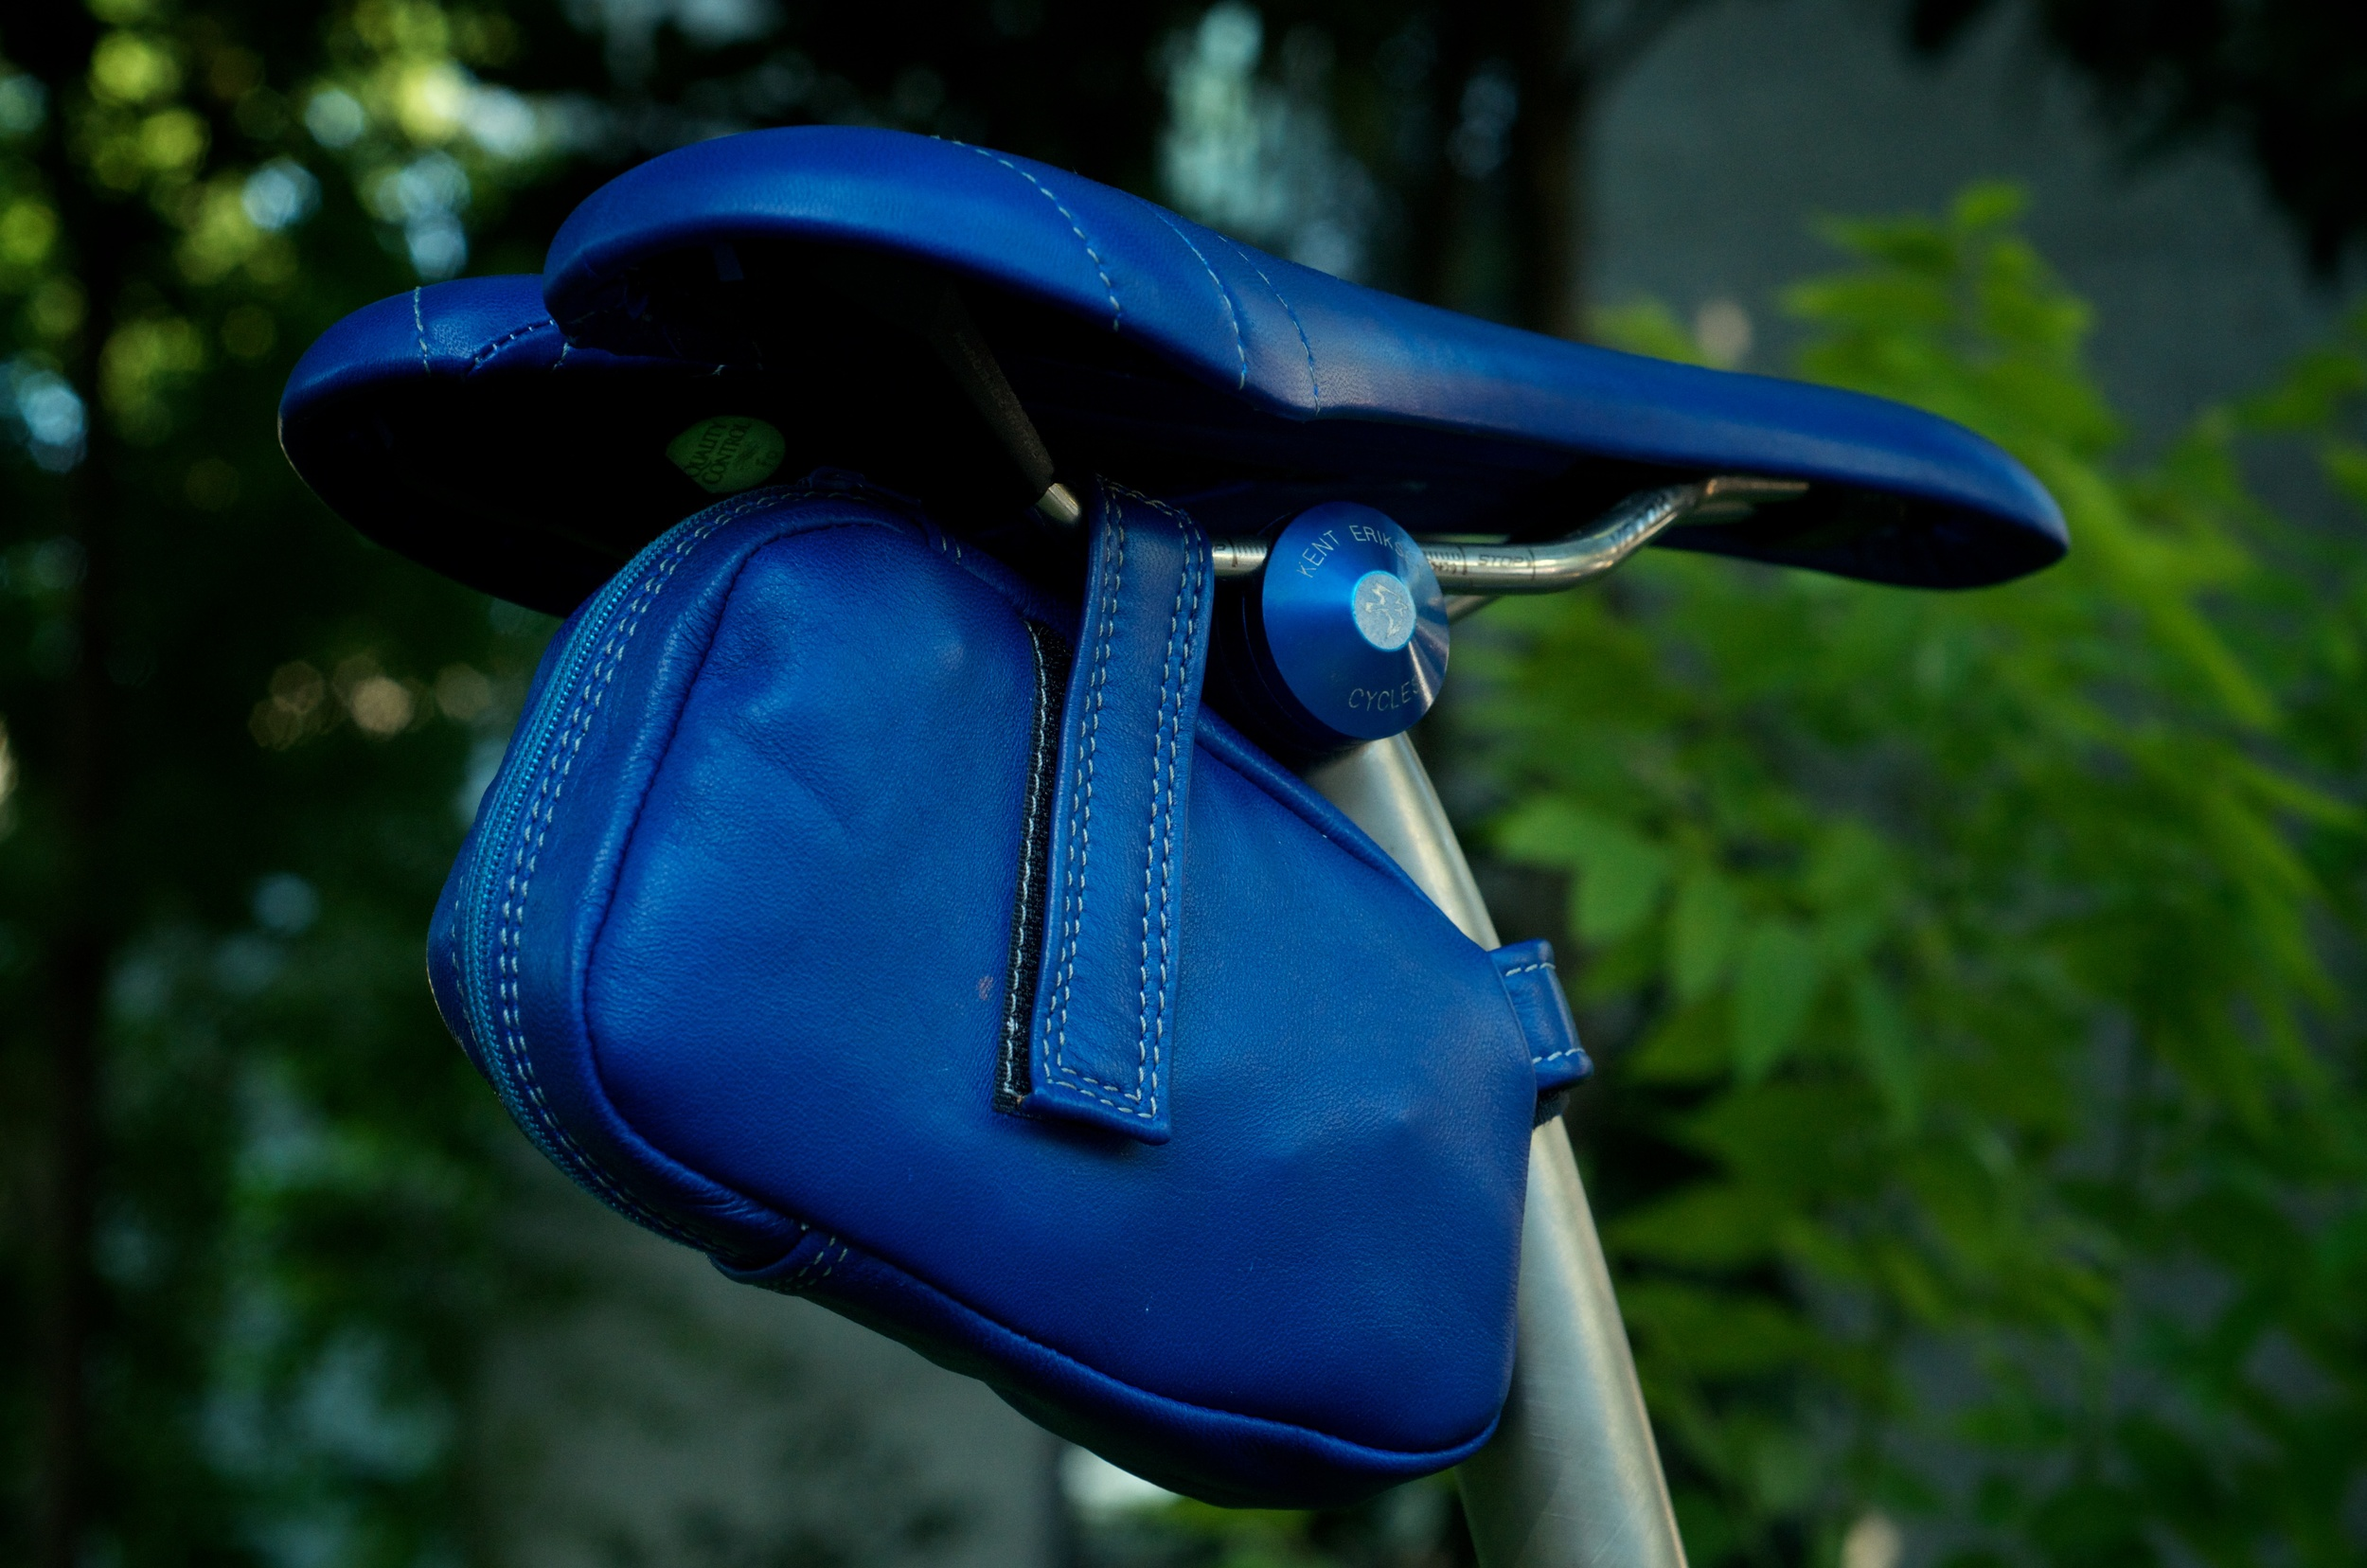 Custom-blue-leather-Selle_Italia-SLK-recover-repair-saddle-bag-handmade-Austin-texas-Willits-eriksen-vintage-brooks-busyman-grey-seat-vintage 4.jpg